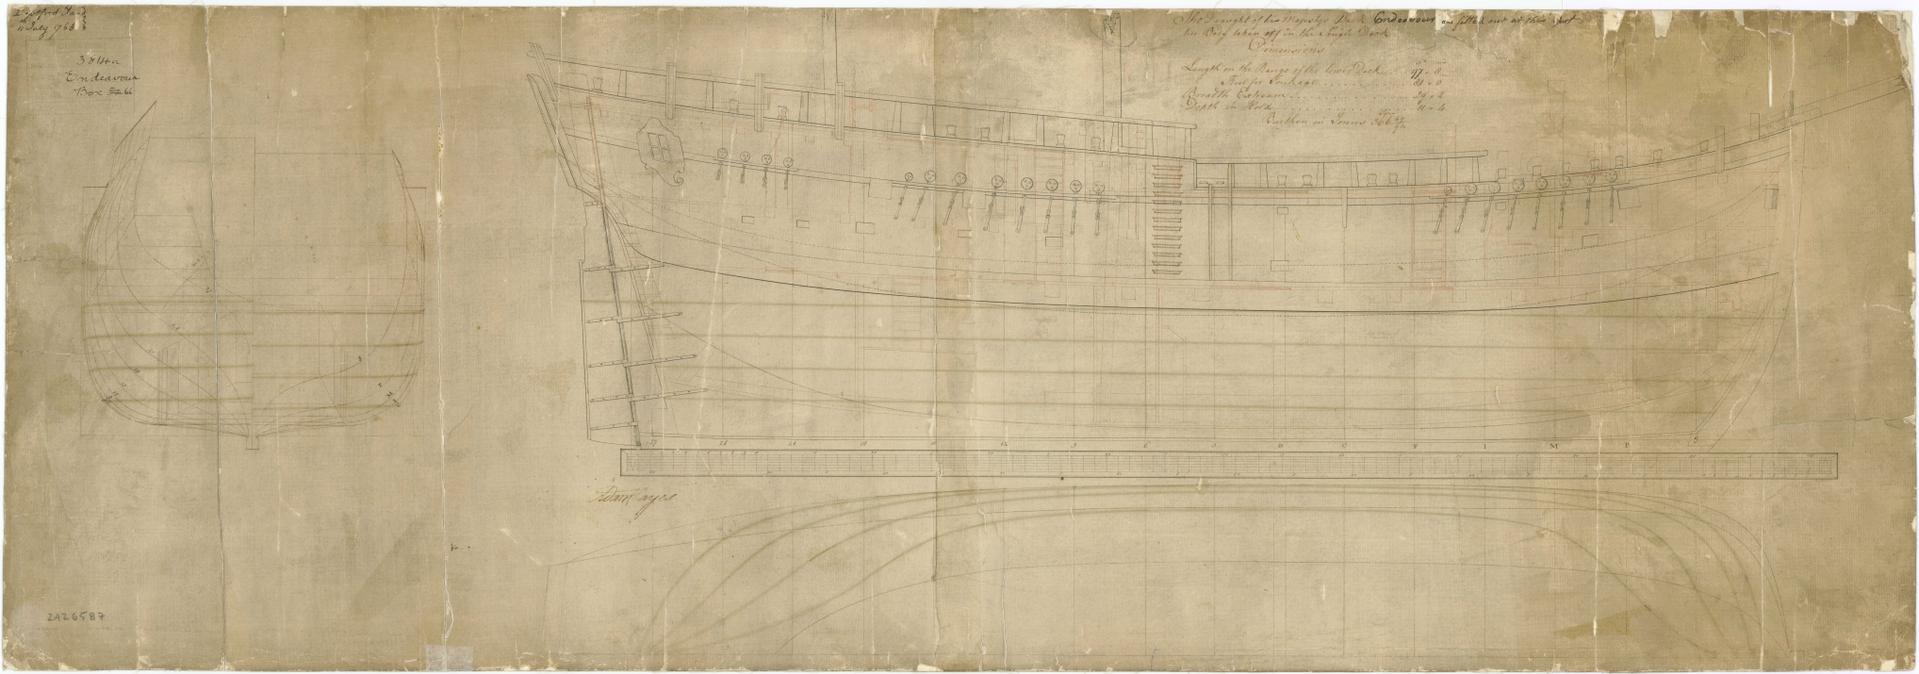 Endeavour (1768) RMG J2056.png